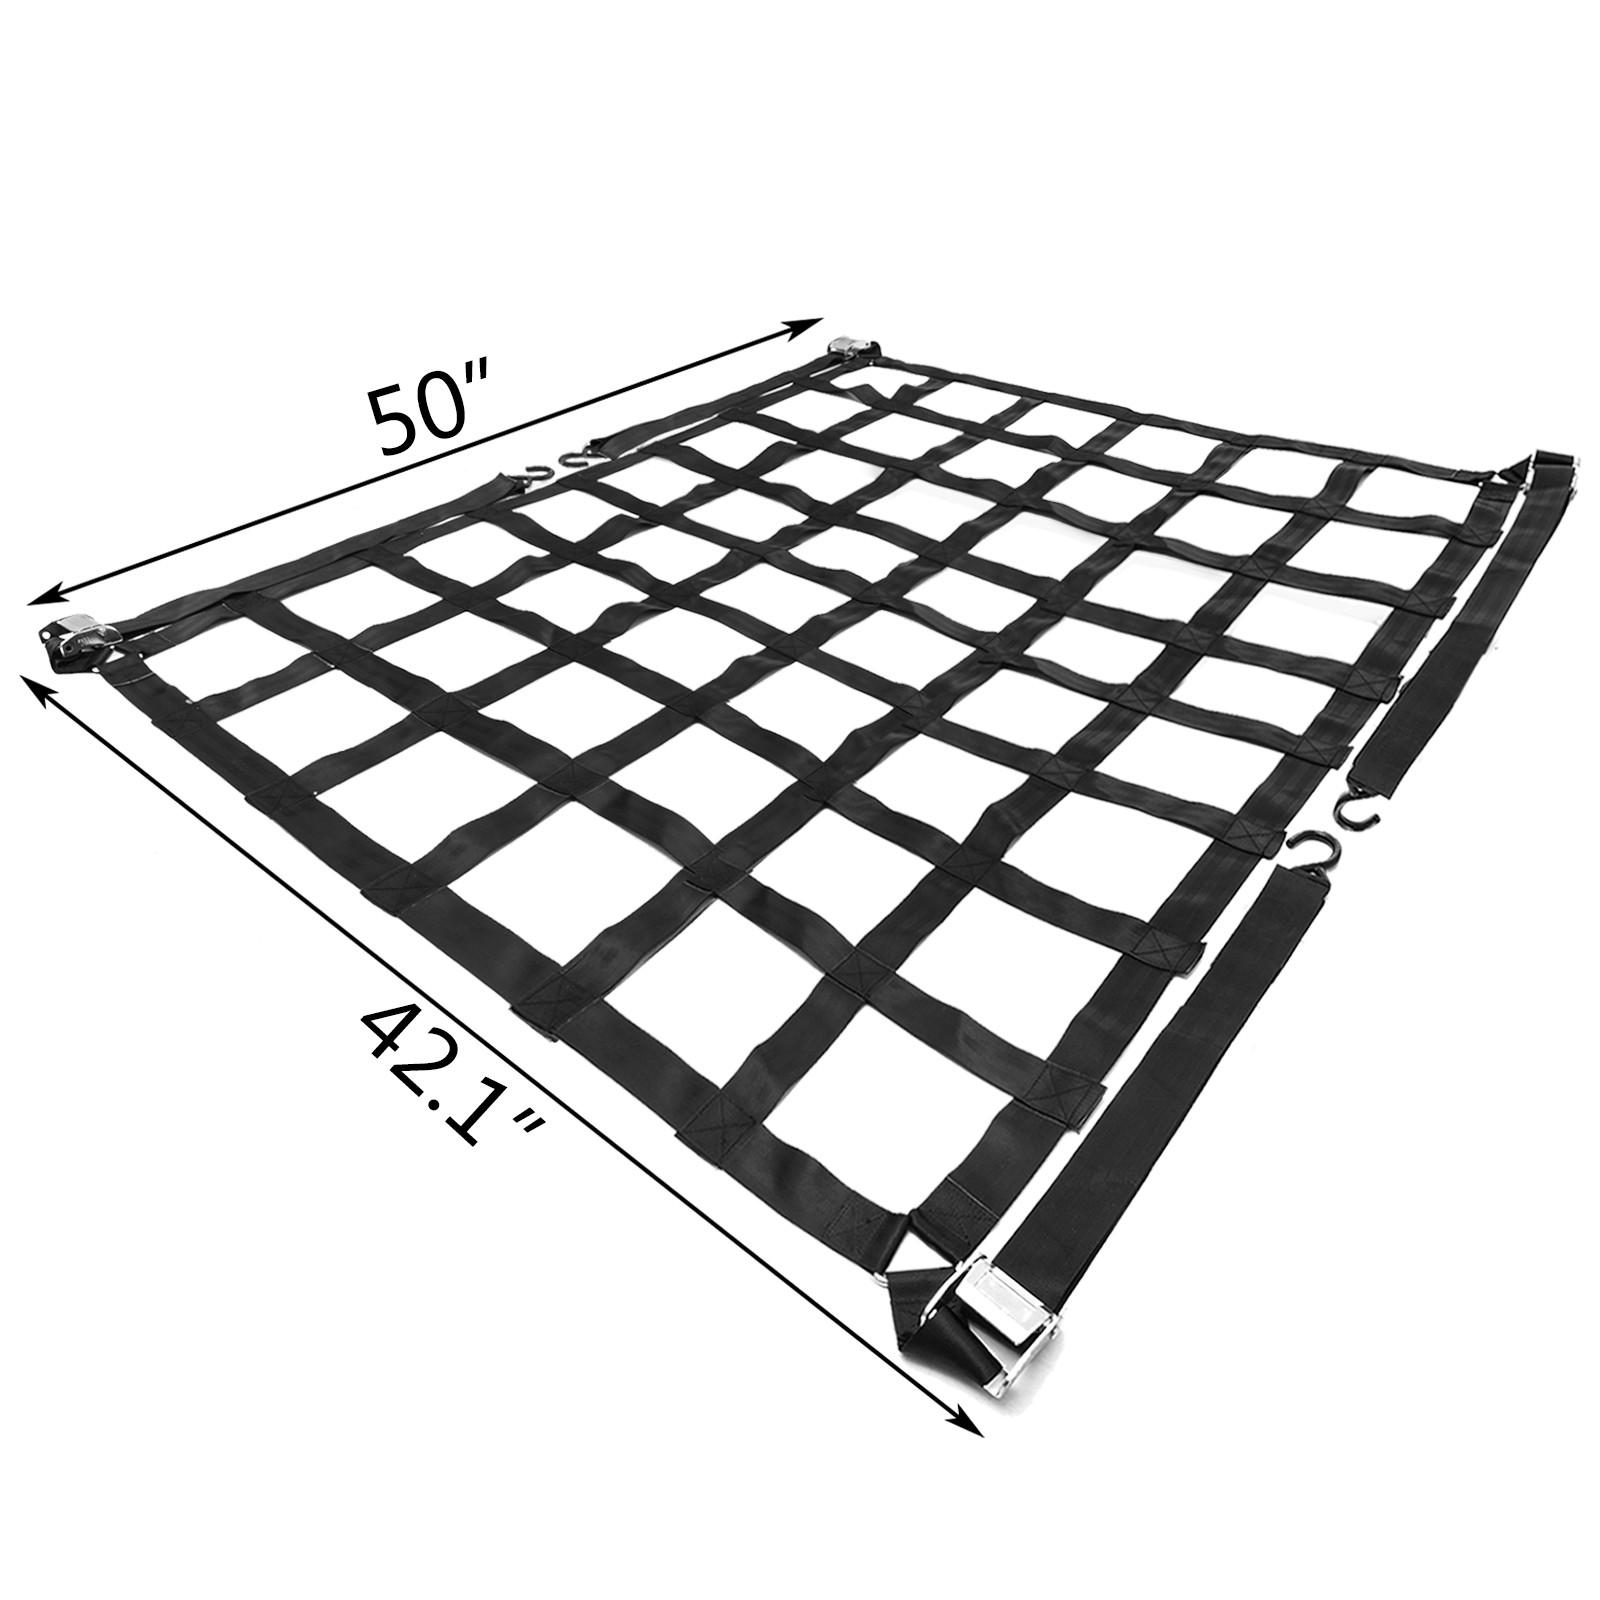 Truck Bed Cargo Net Safety Web 500kg//1100lb Pickup Trucks Truck Cargo Net NEWEST